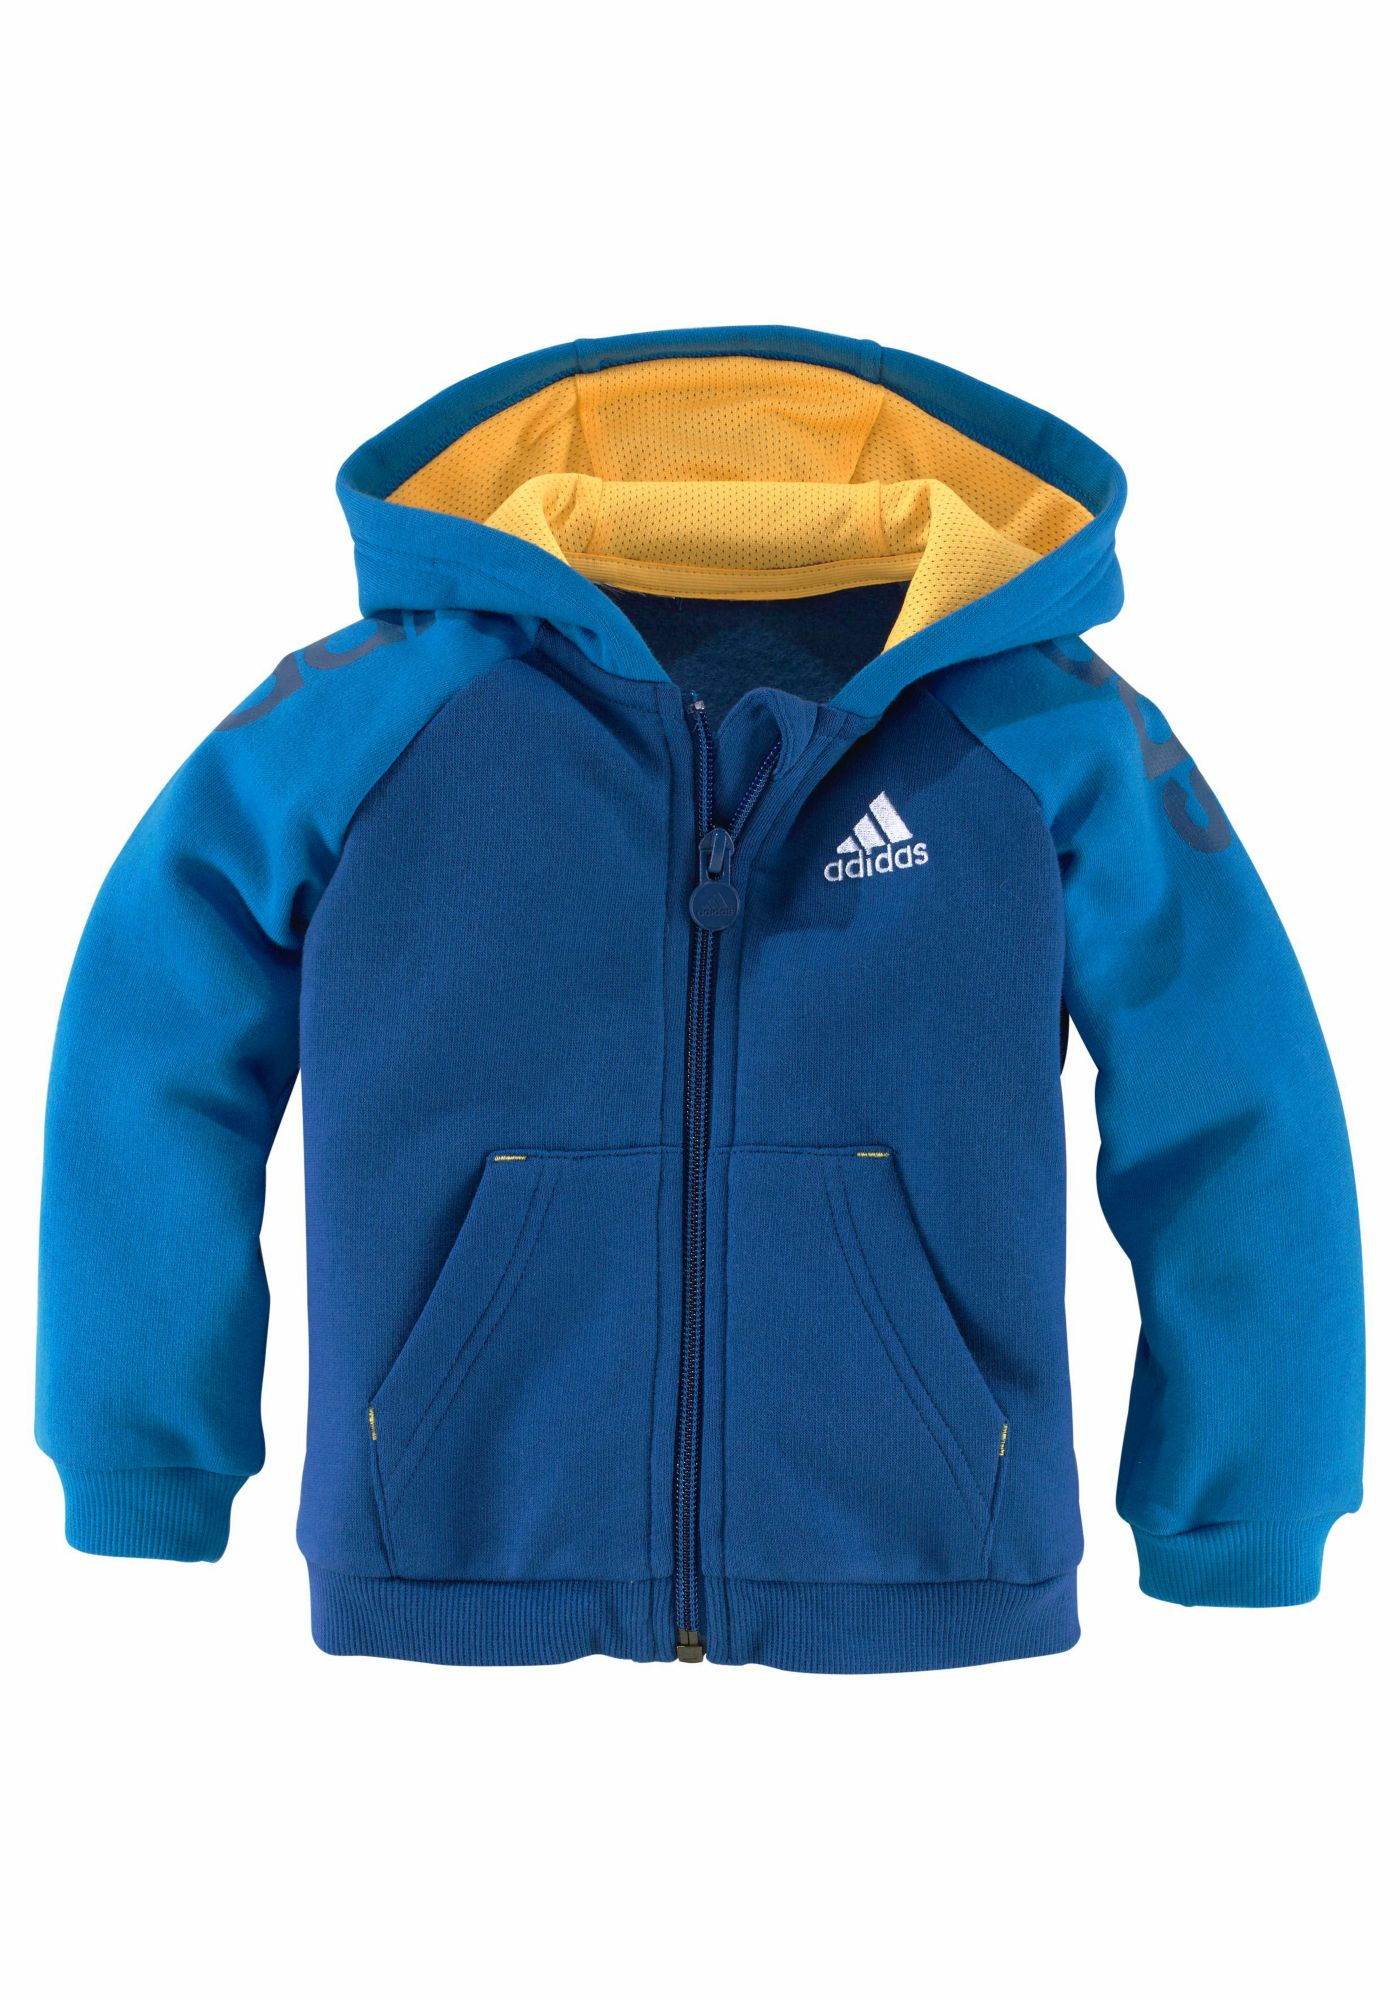 ADIDAS PERFORMANCE adidas Performance Jogginganzug »INFANTS 3 STRIPES FULL ZIP HOODIE TRACKSUIT«